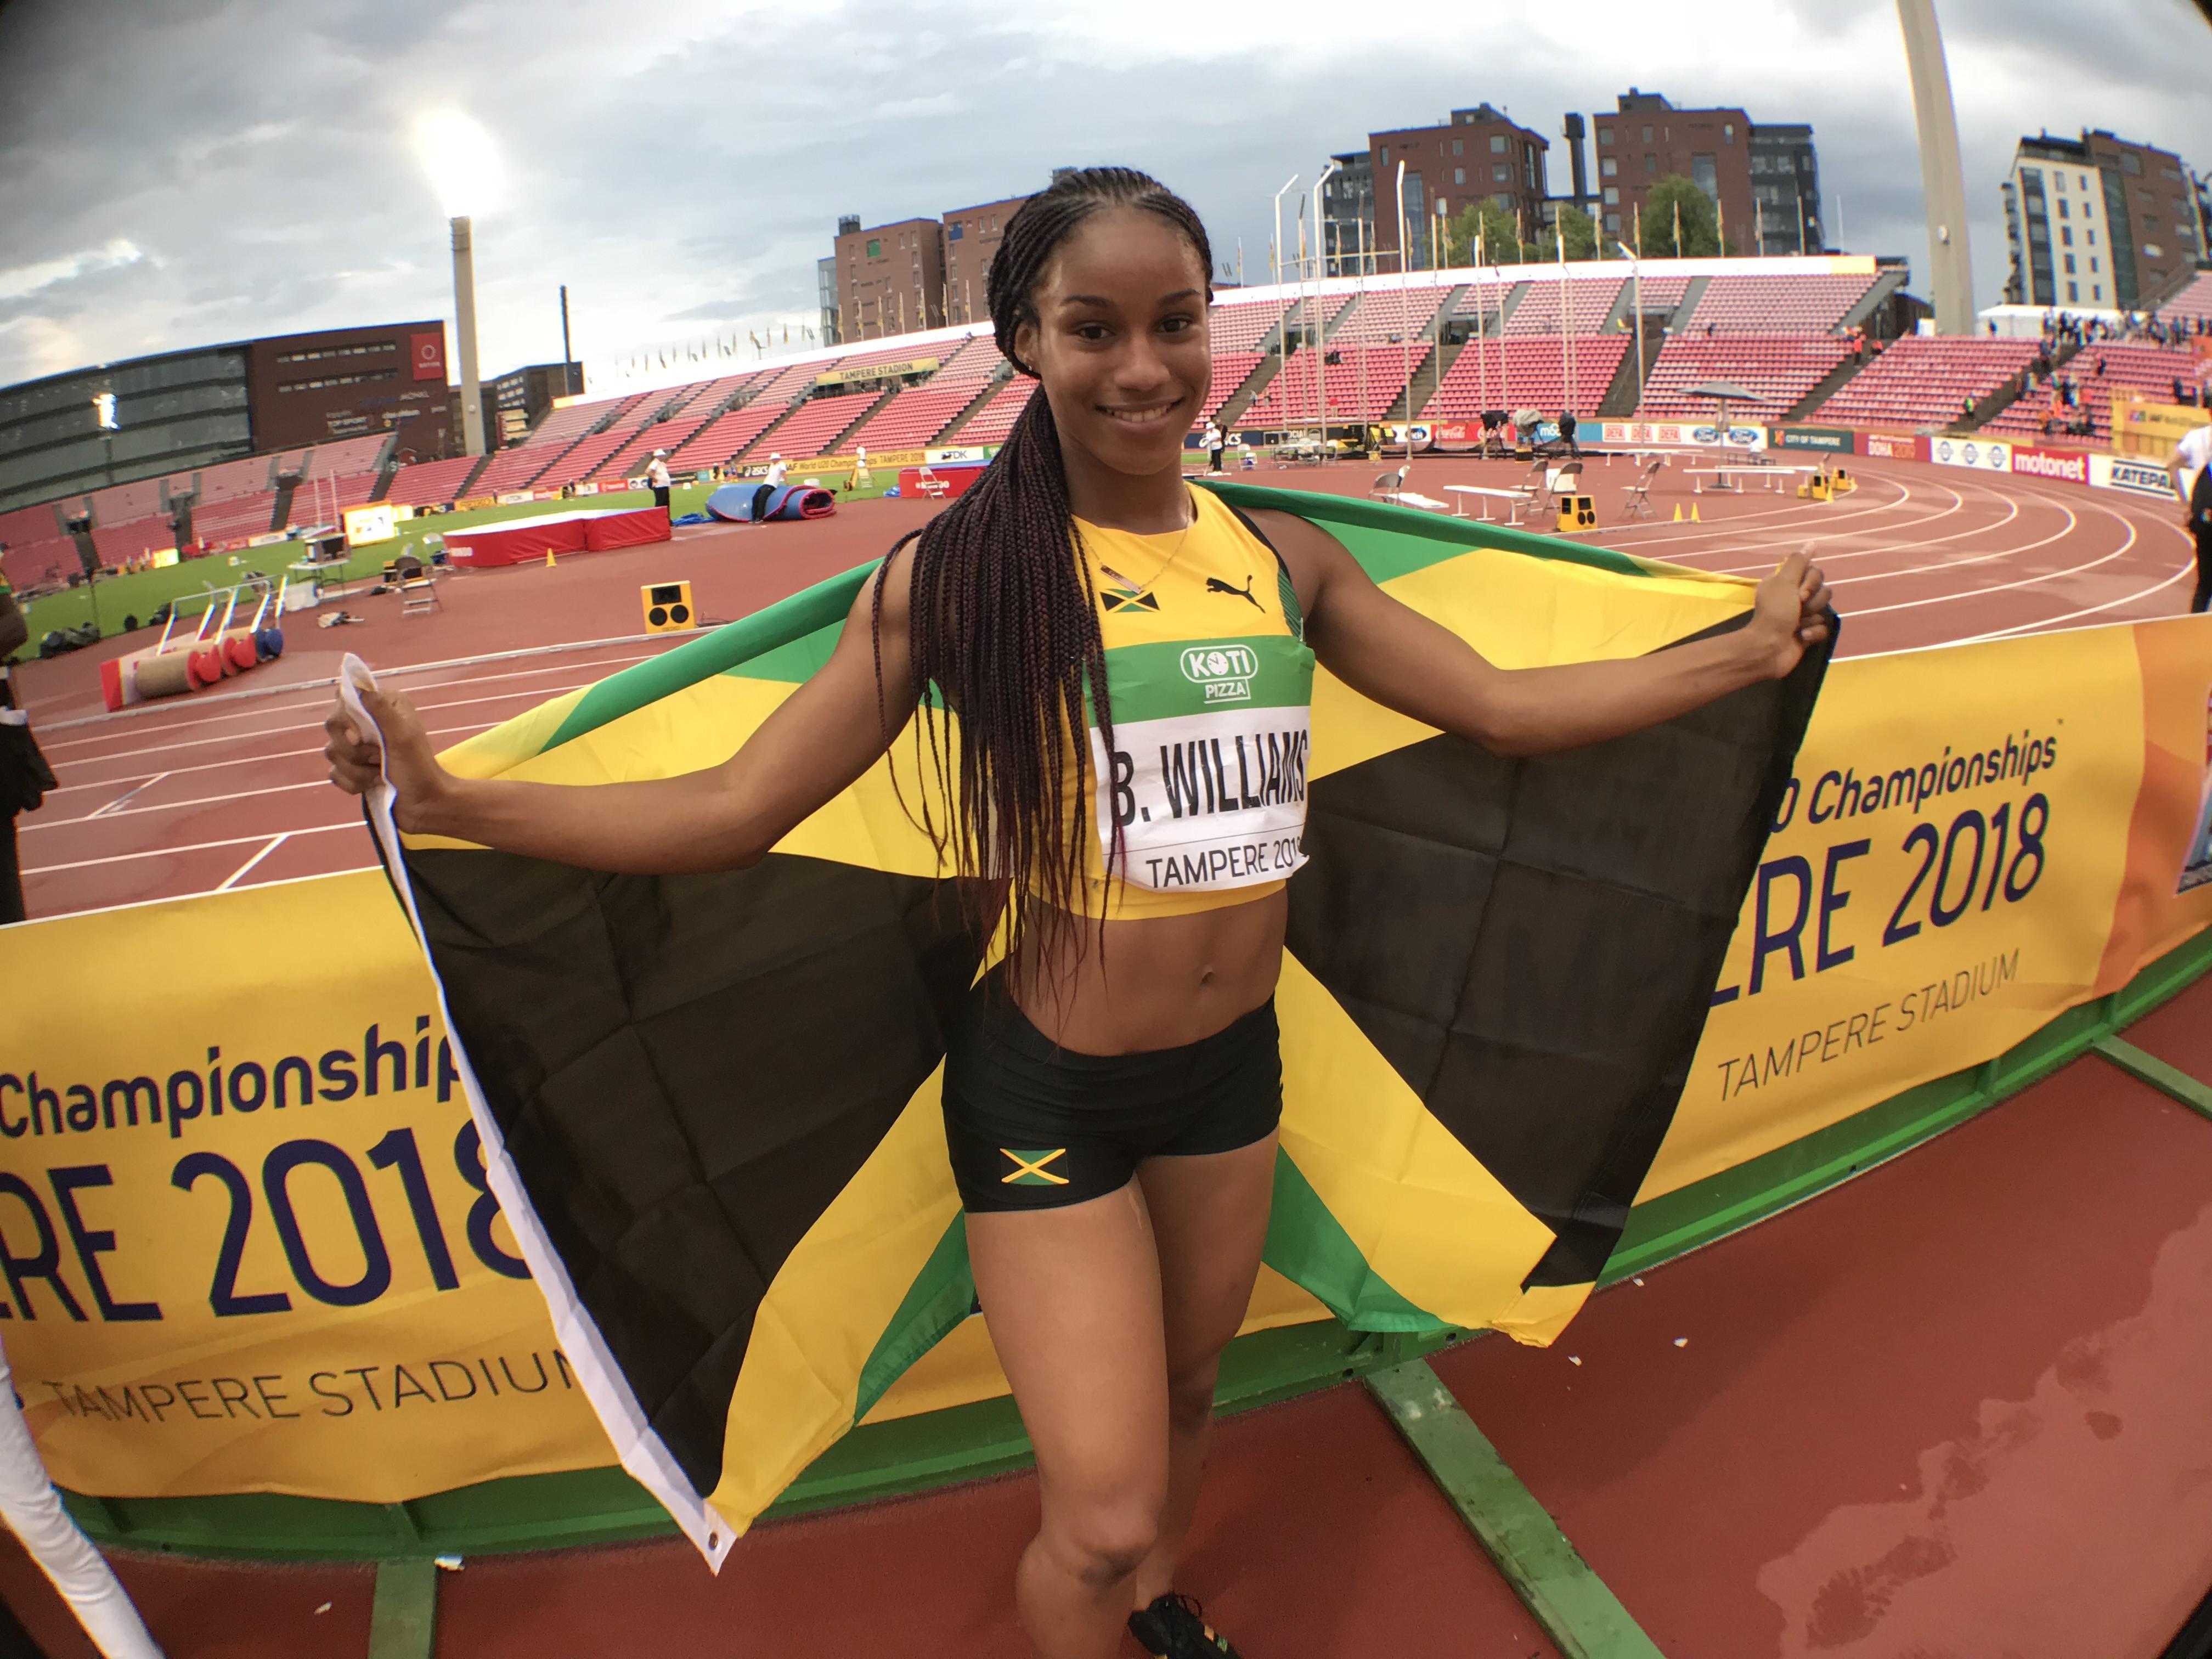 17-year-old Jamaican sprinter Briana Williams fails drugs test